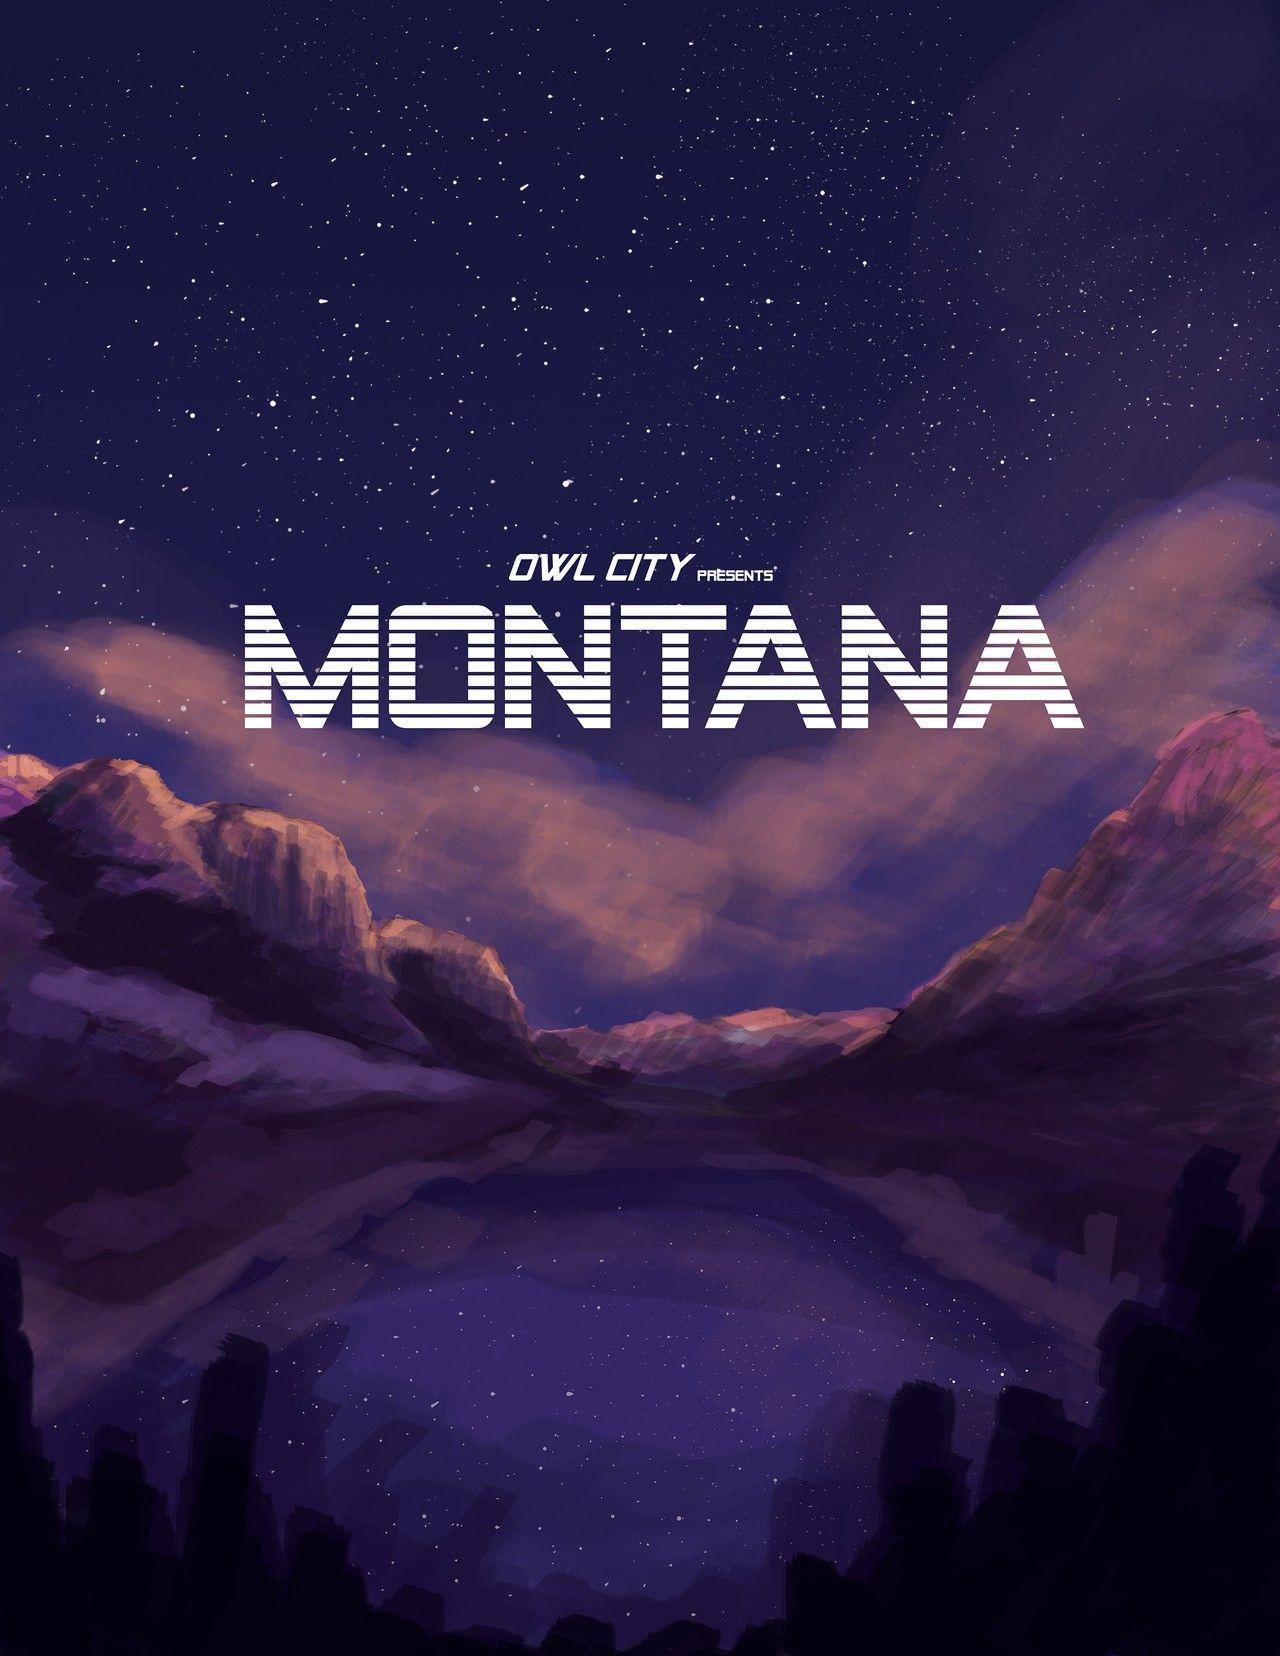 Montana - Owl City | Owl city, Owl city lyrics, City sky